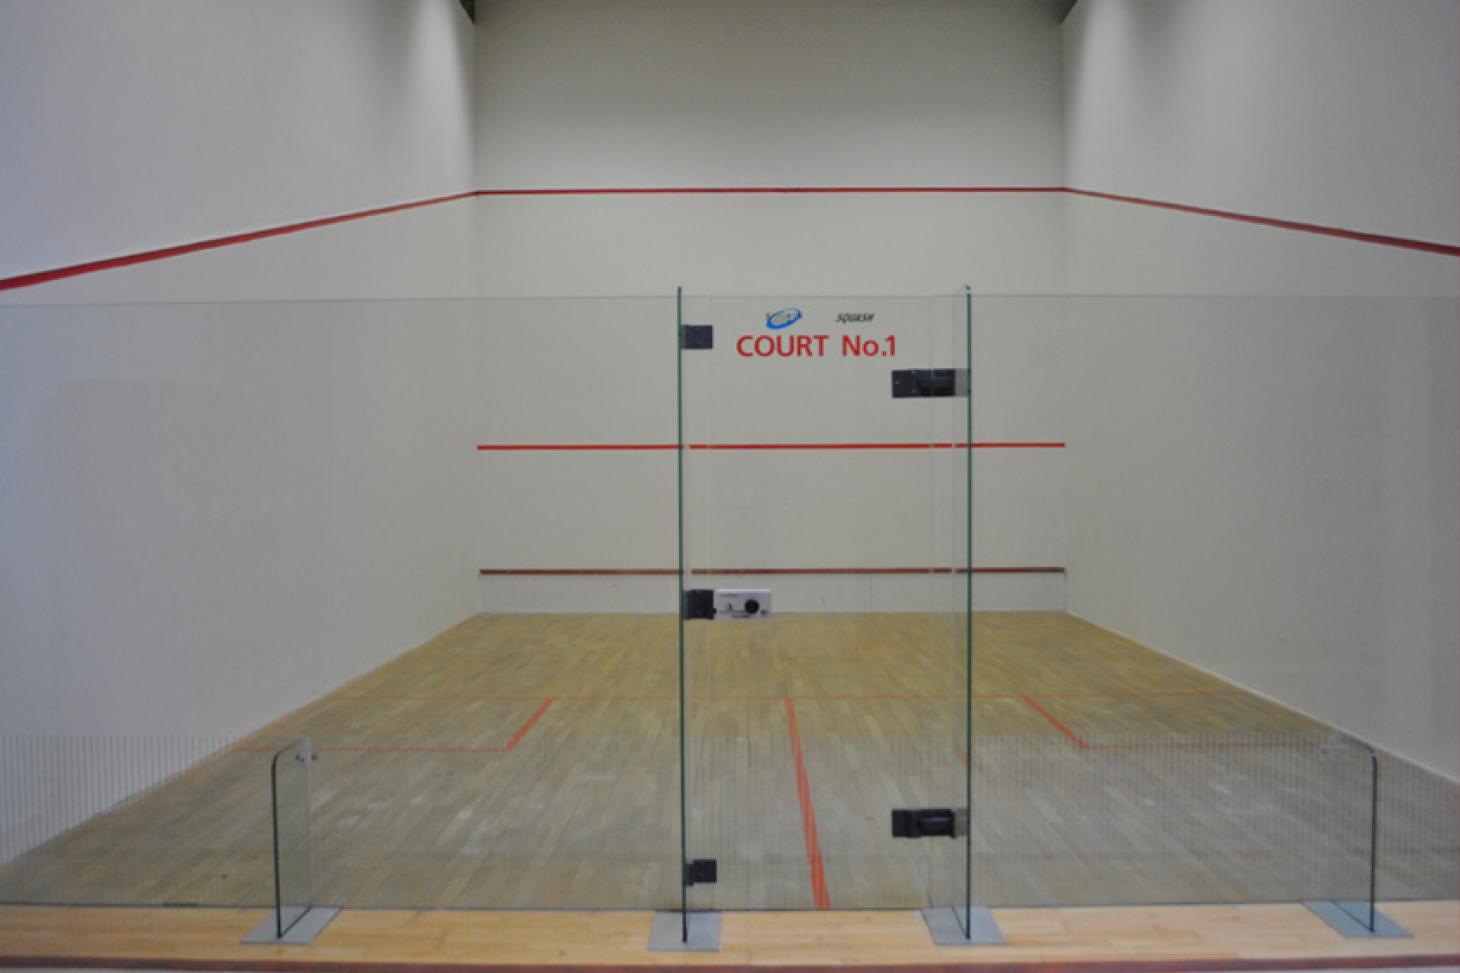 Sportslink Indoor | Hard squash court